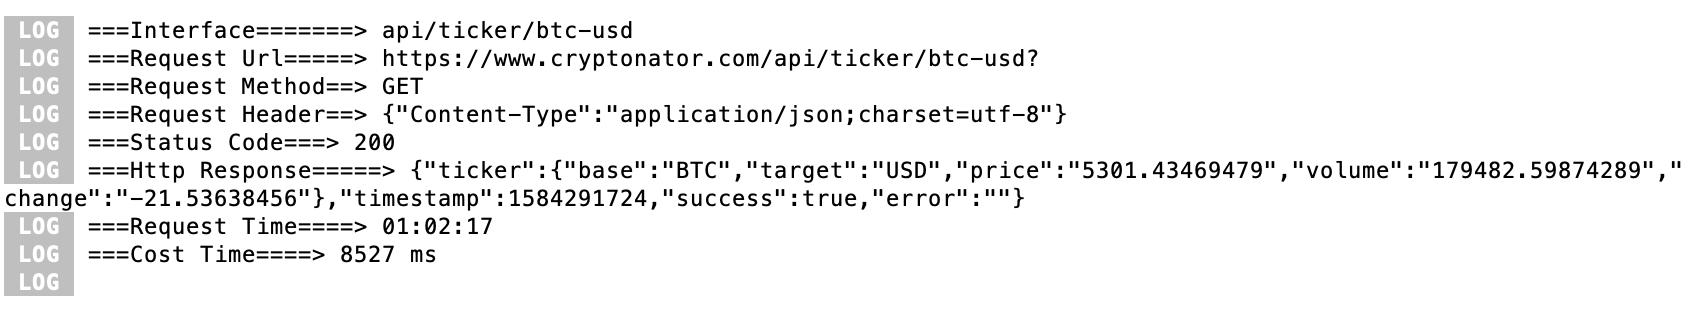 custom_parse_data_log.png